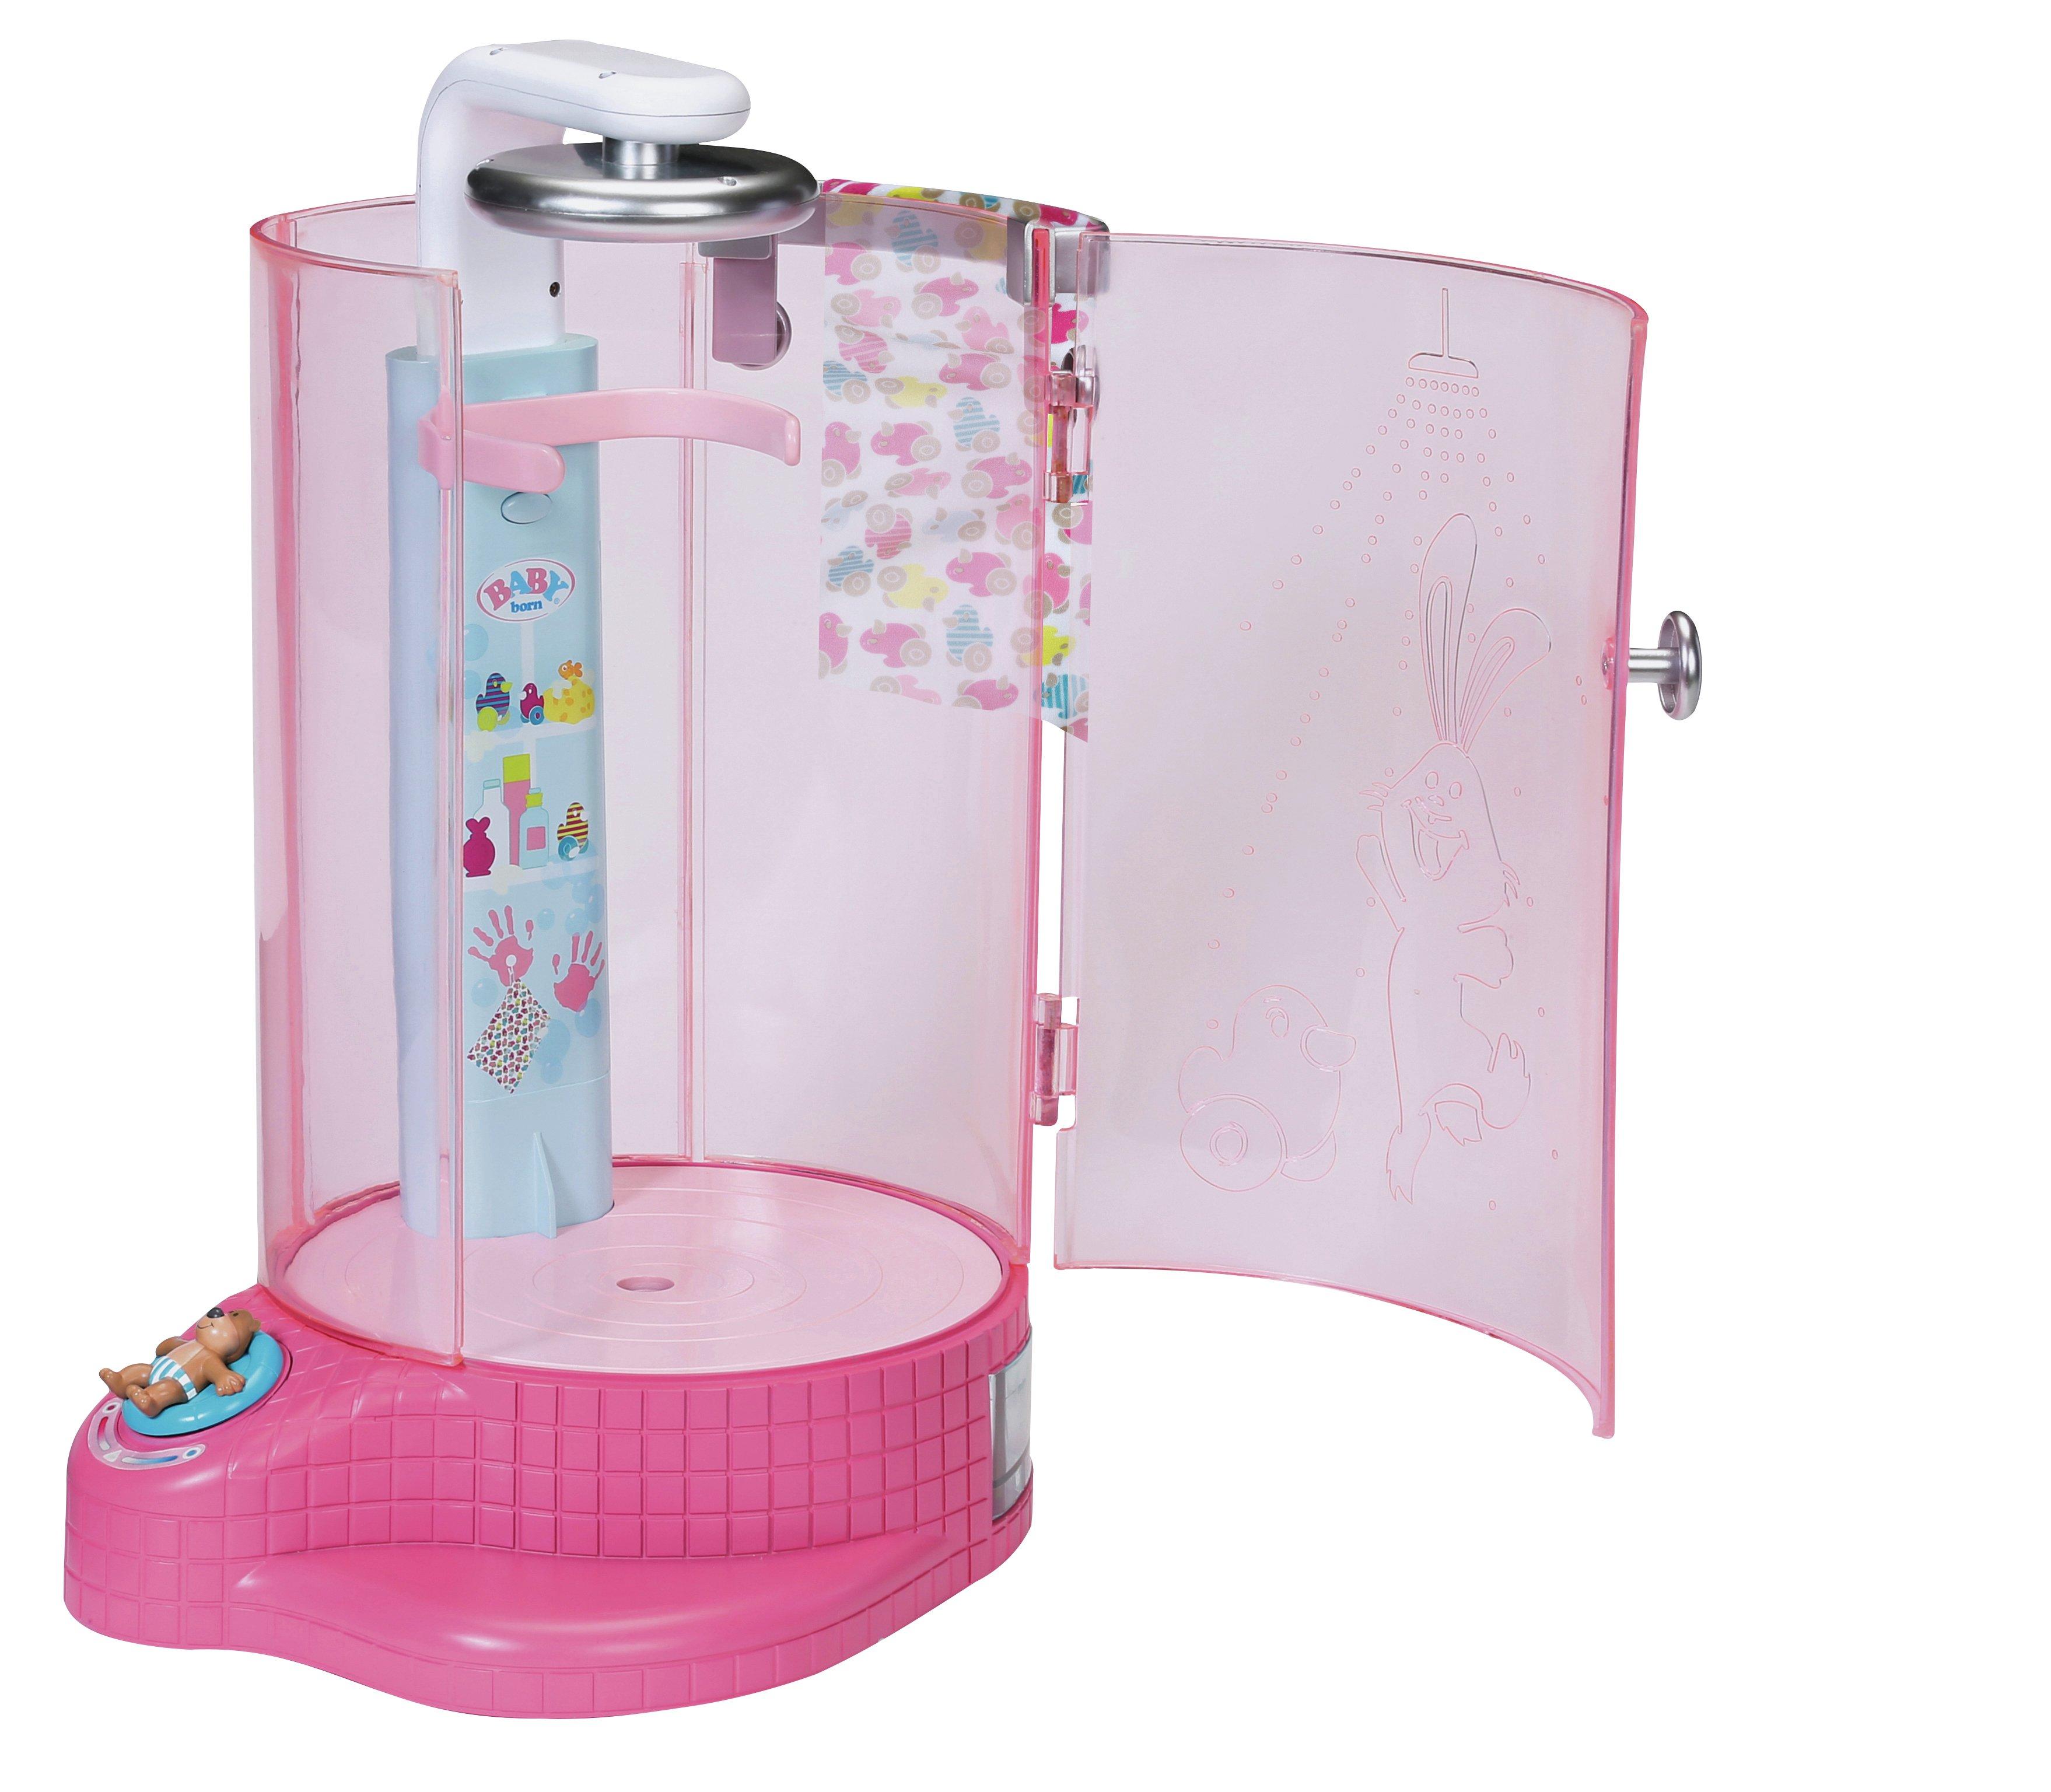 Image of BABY Born Rain Fun Shower